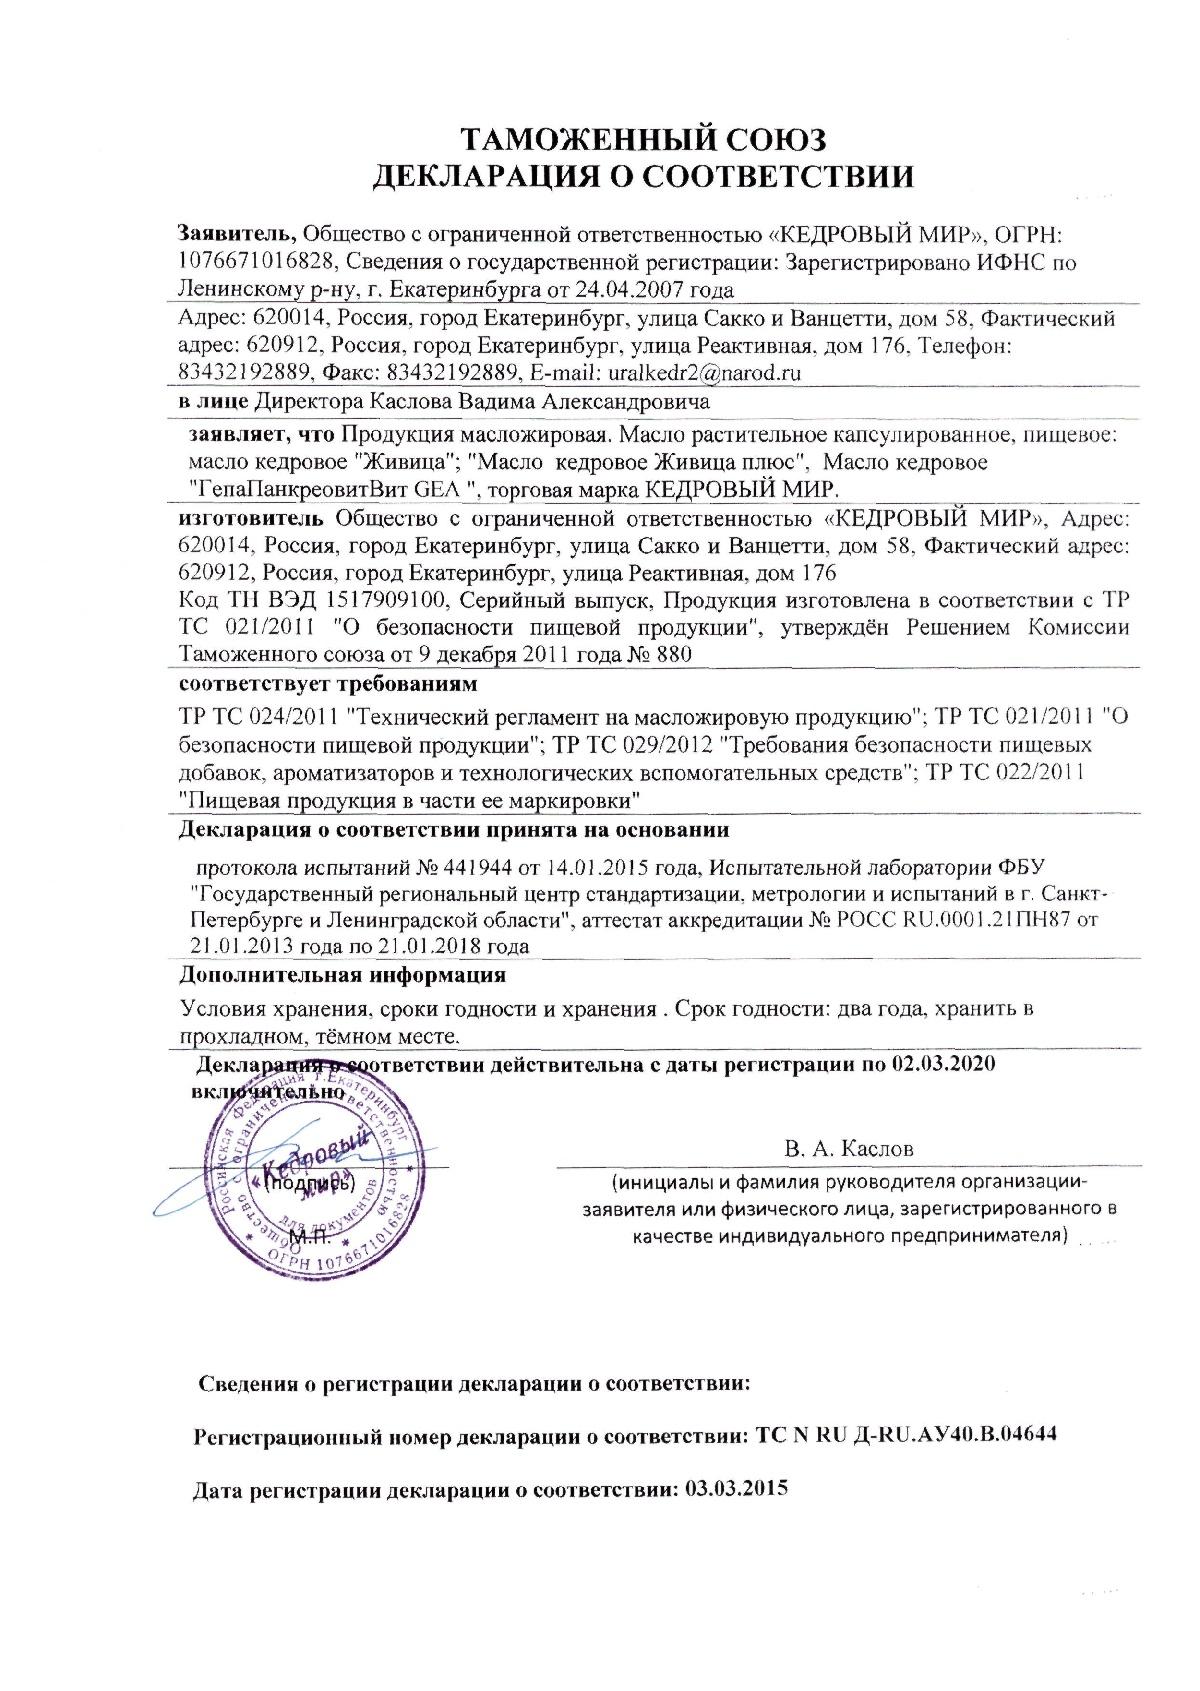 Deklaracii mirkedr.ru 001